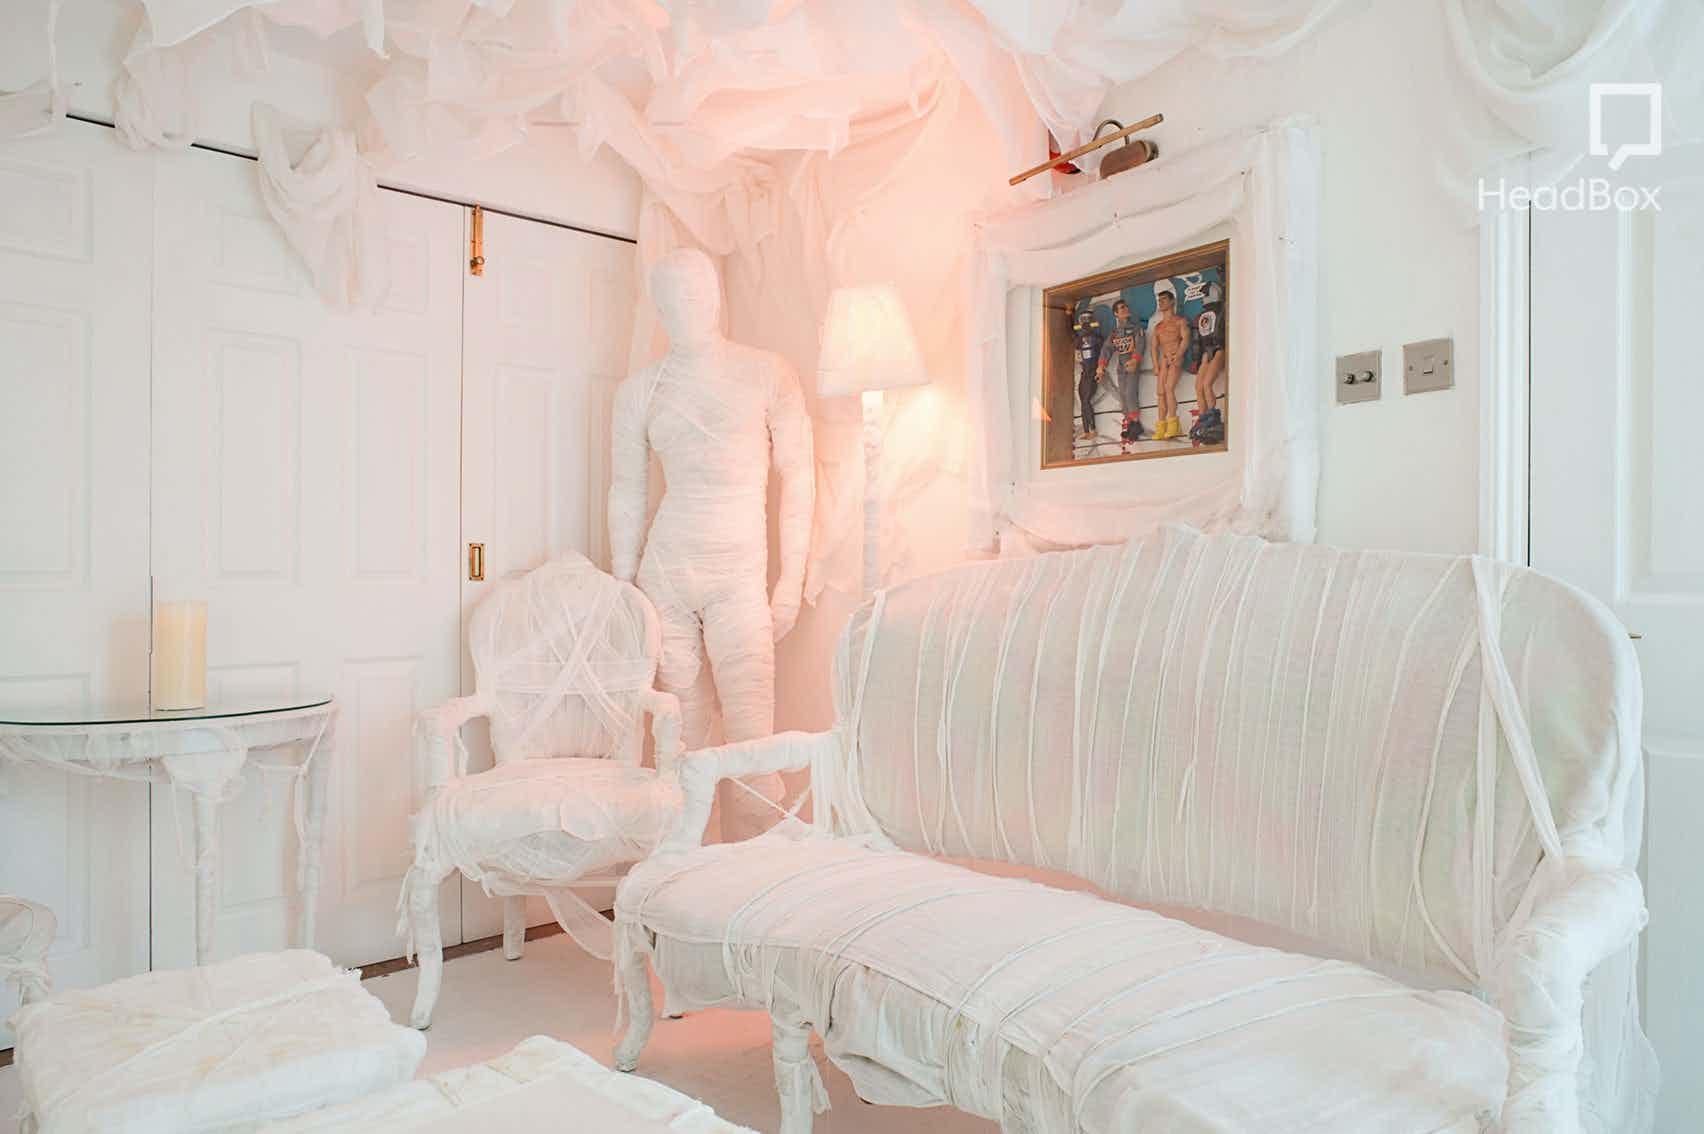 Bandage Room, Day Hire, ninetyeight bar